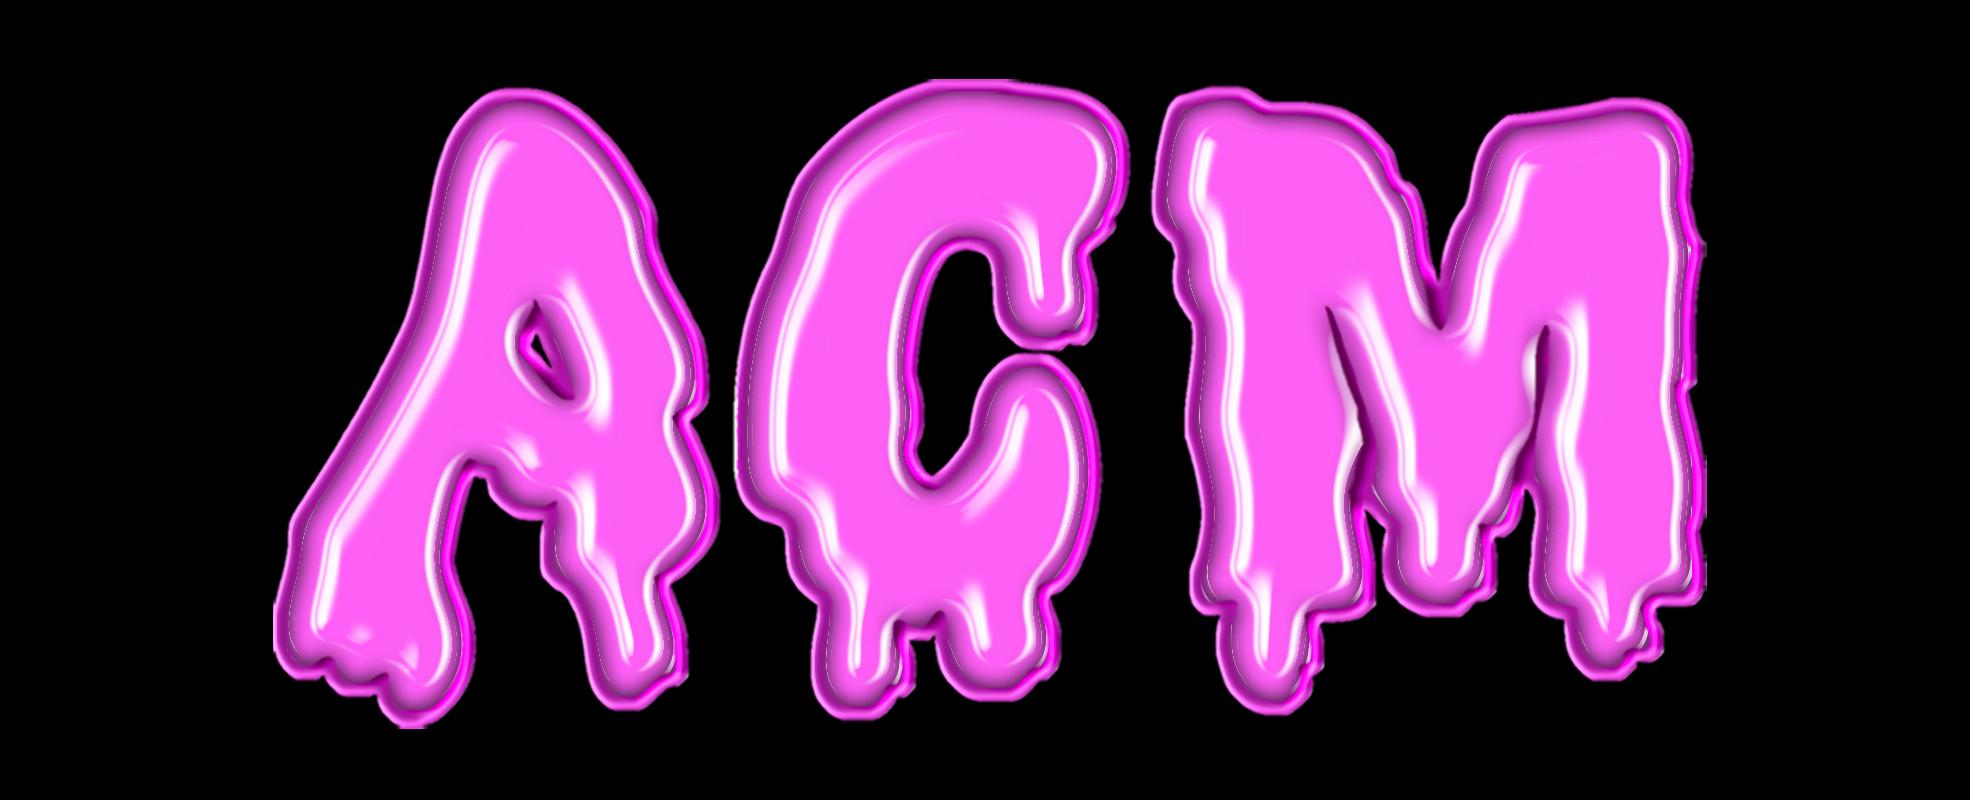 LOGO_ACM_2.0.jpg